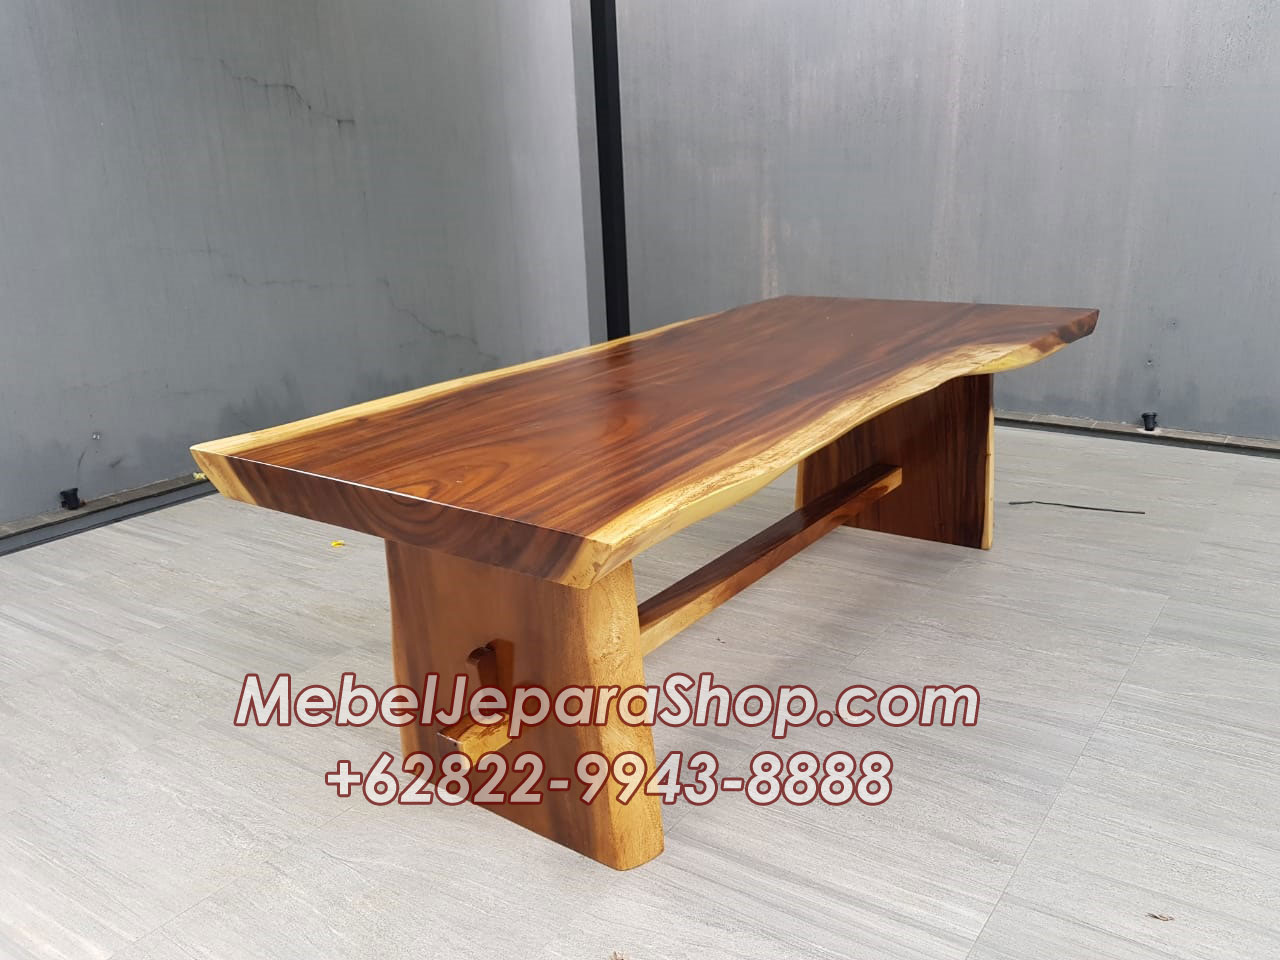 meja trembesi kecil murah - meja-trembesi-kecil-murah